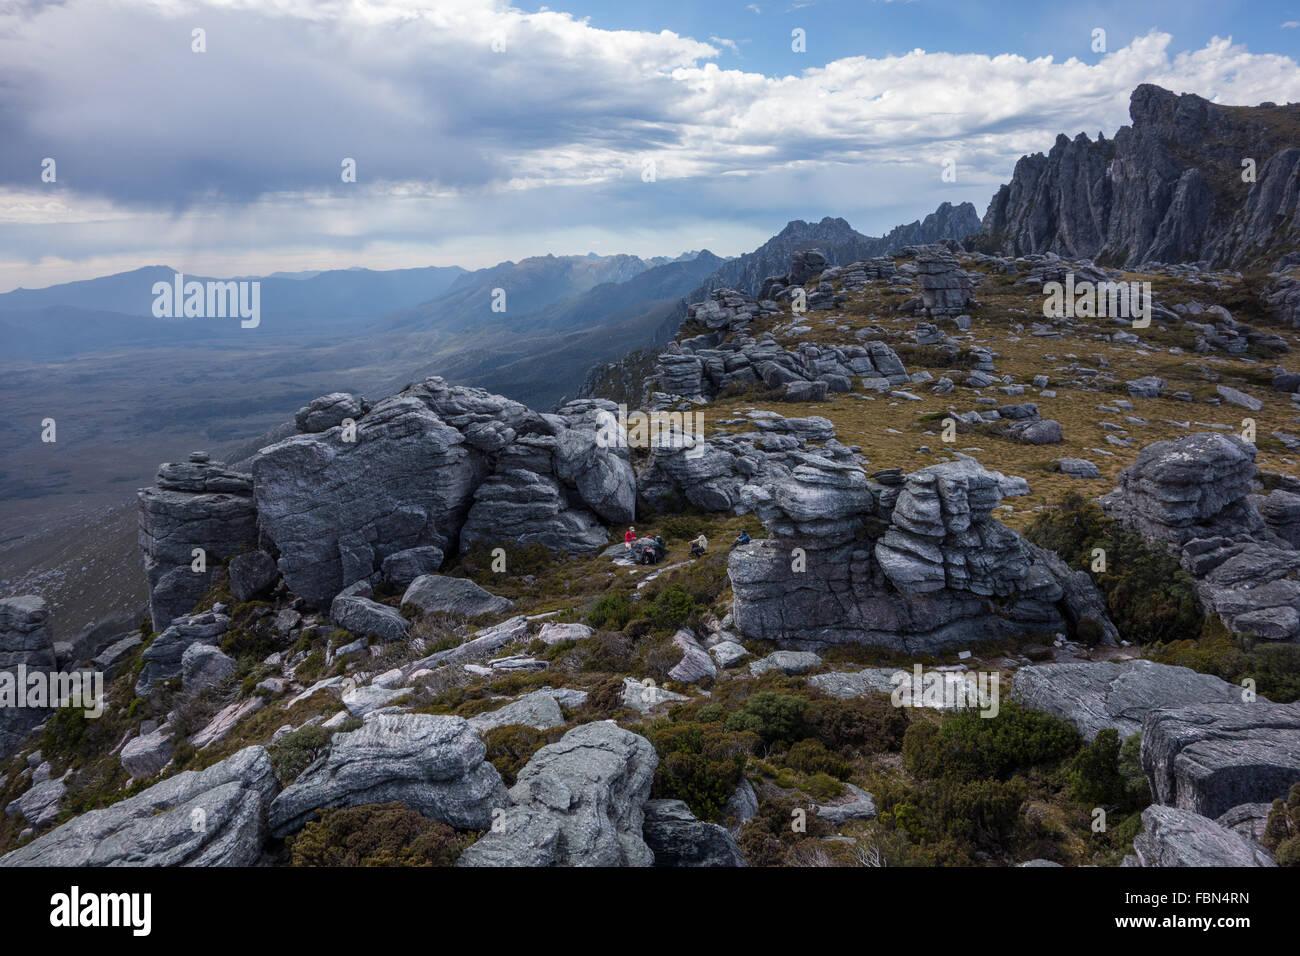 Western Arthurs range, Tasmania - Stock Image